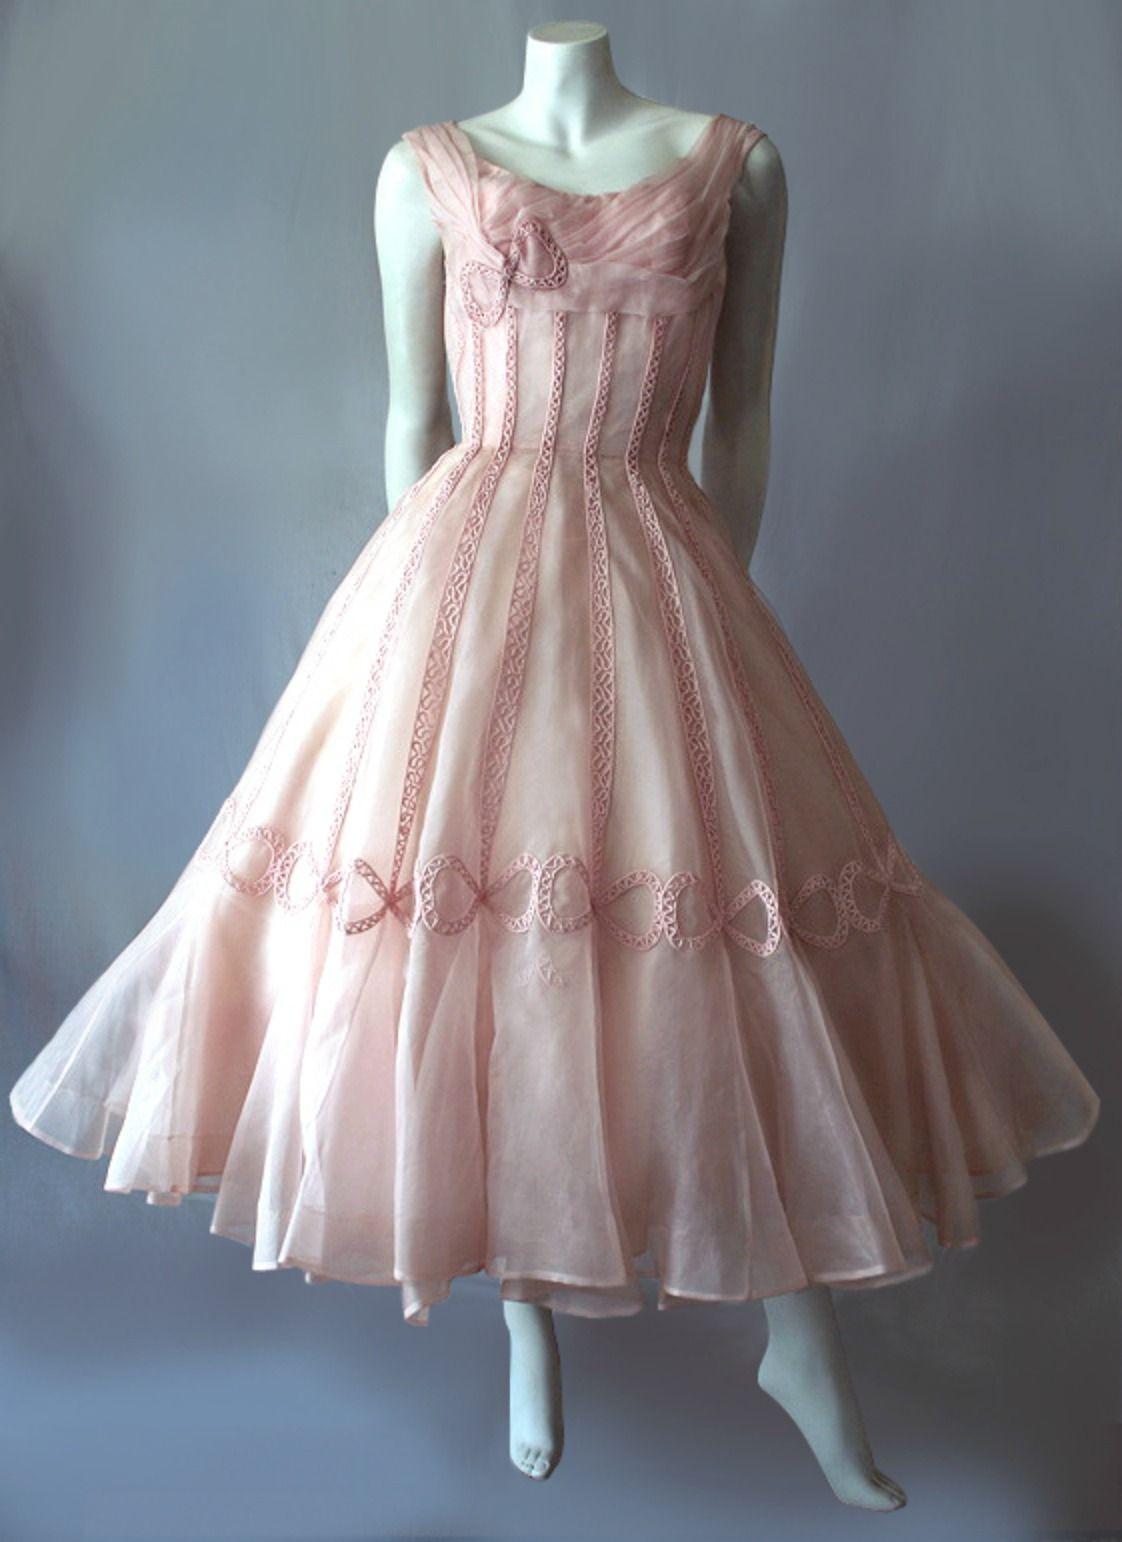 1950 S Pink Ceil Chapman Formal Dress Vintage Dresses Vintage 1950s Dresses Pink Cocktail Dress